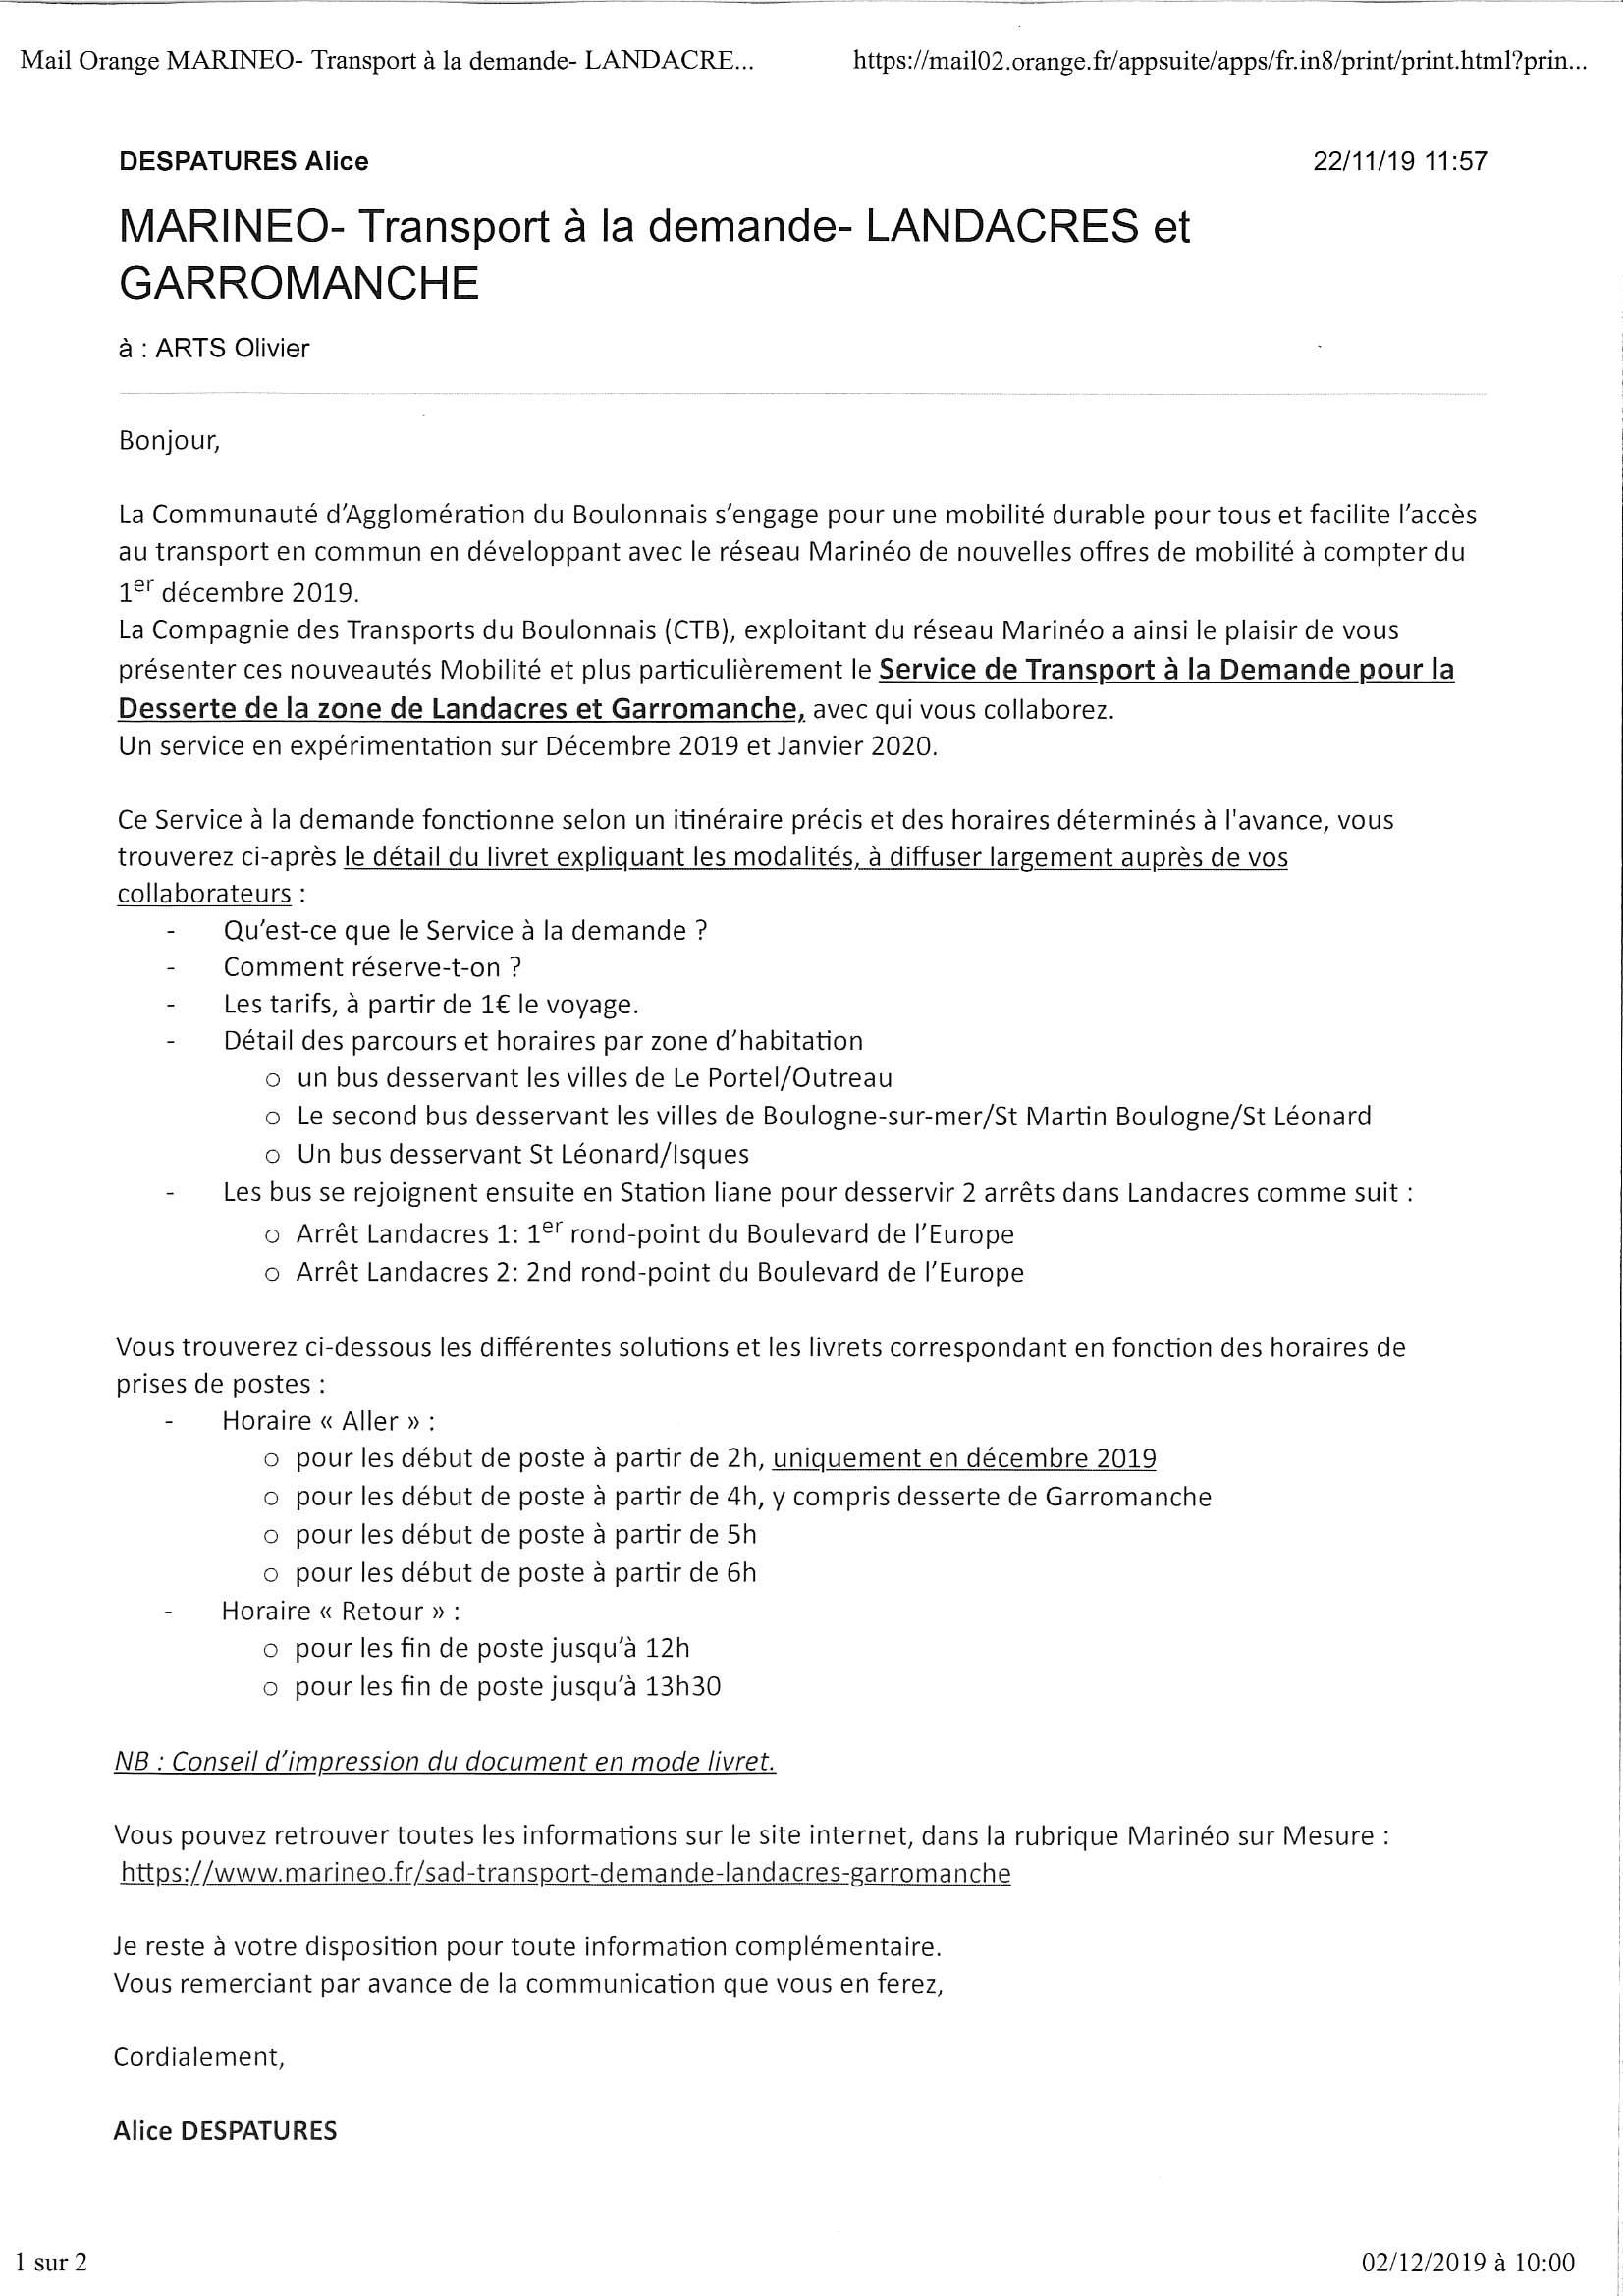 Marineo - Landacres et Garromanche